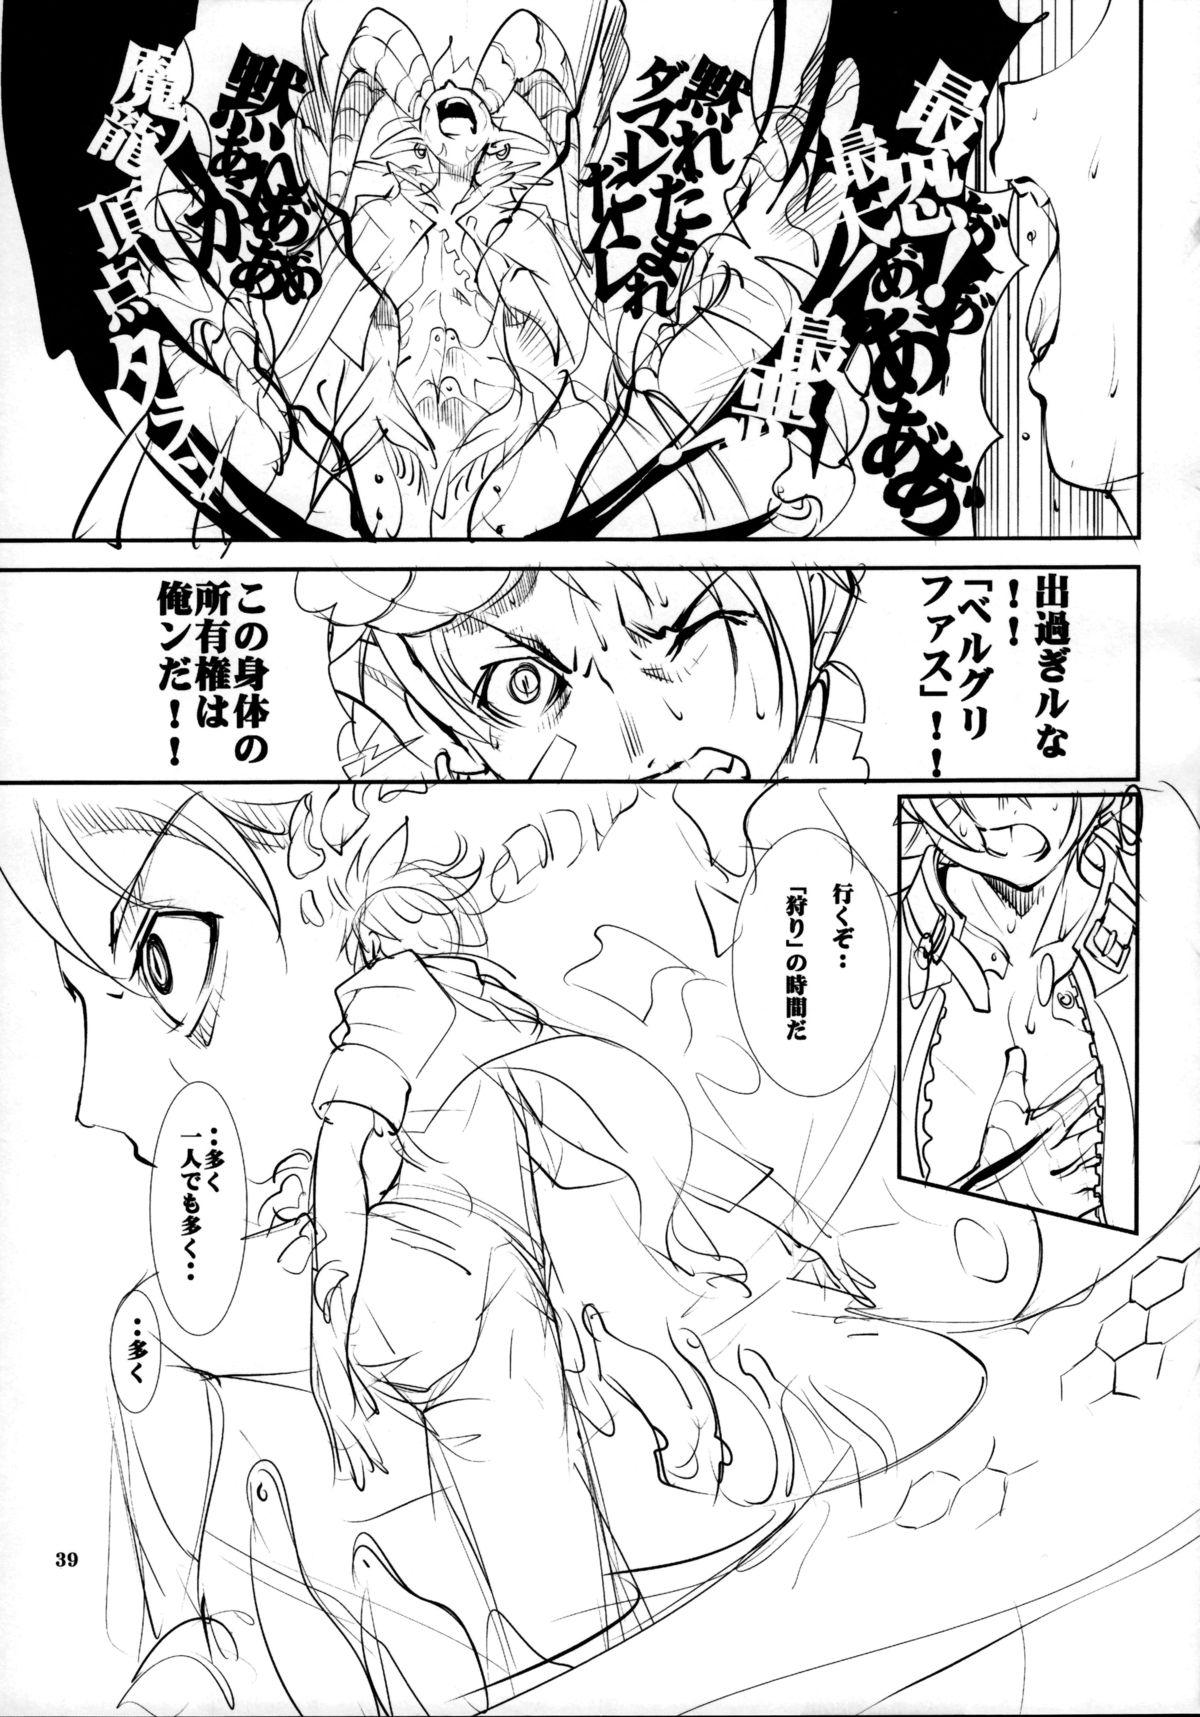 (C89) [Algolagnia (Mikoshiro Honnin)] Naruto [saga] sei (NARUTO) 38